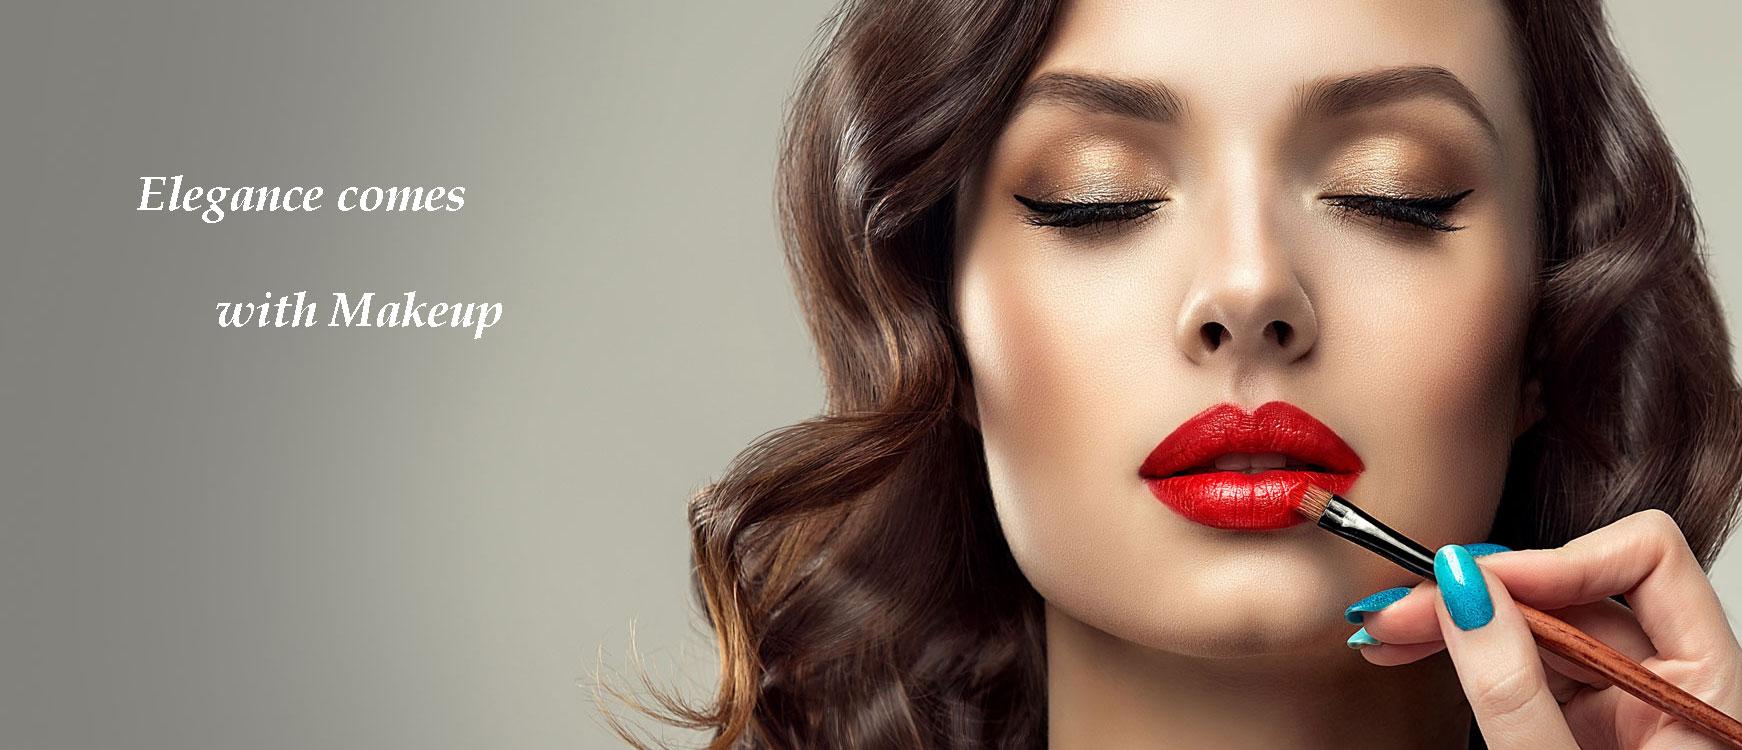 Elegance-with-Makeup